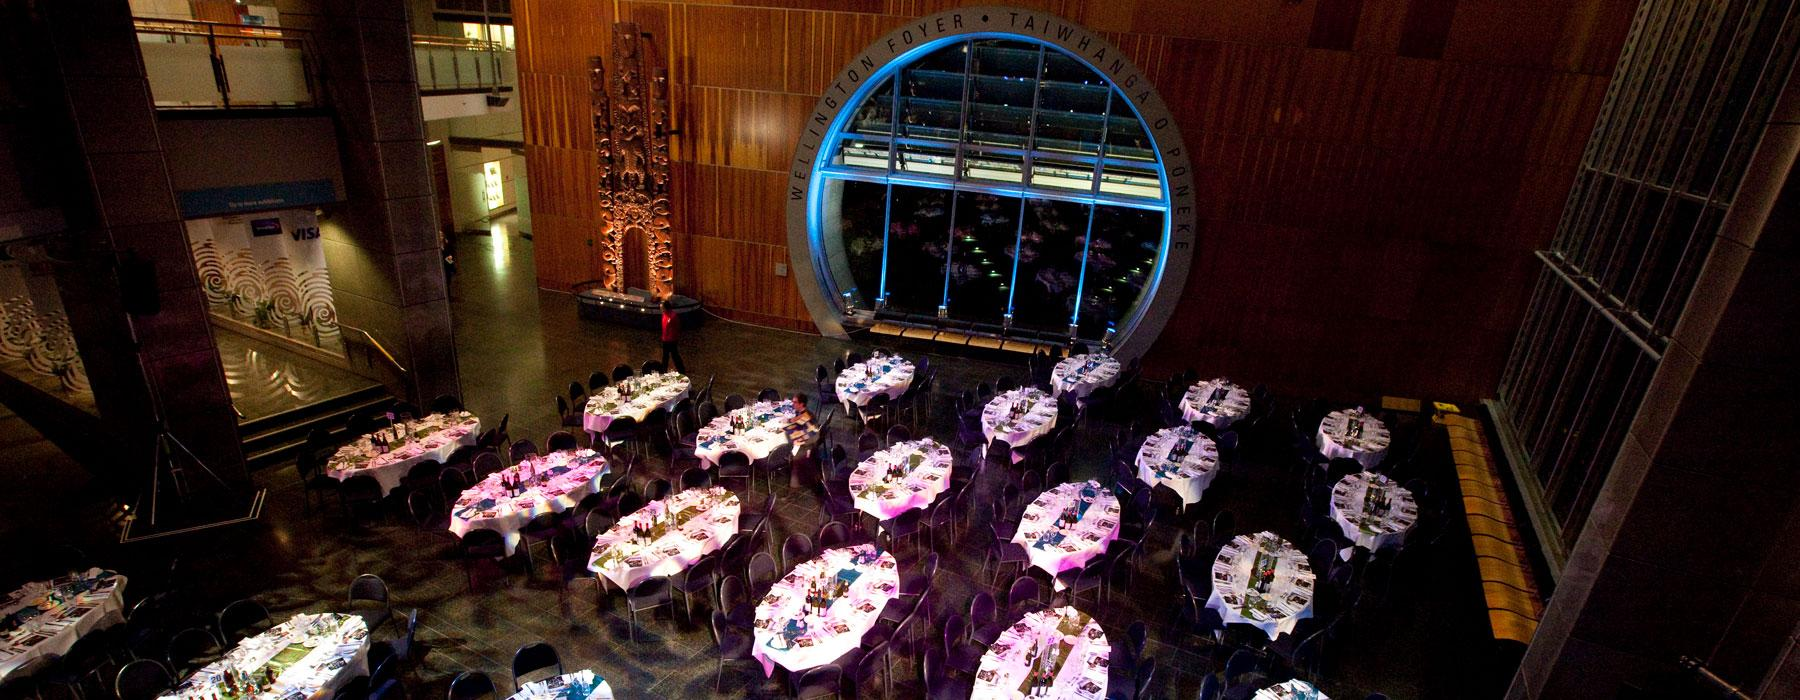 Wellington Foyer venue set up for an event